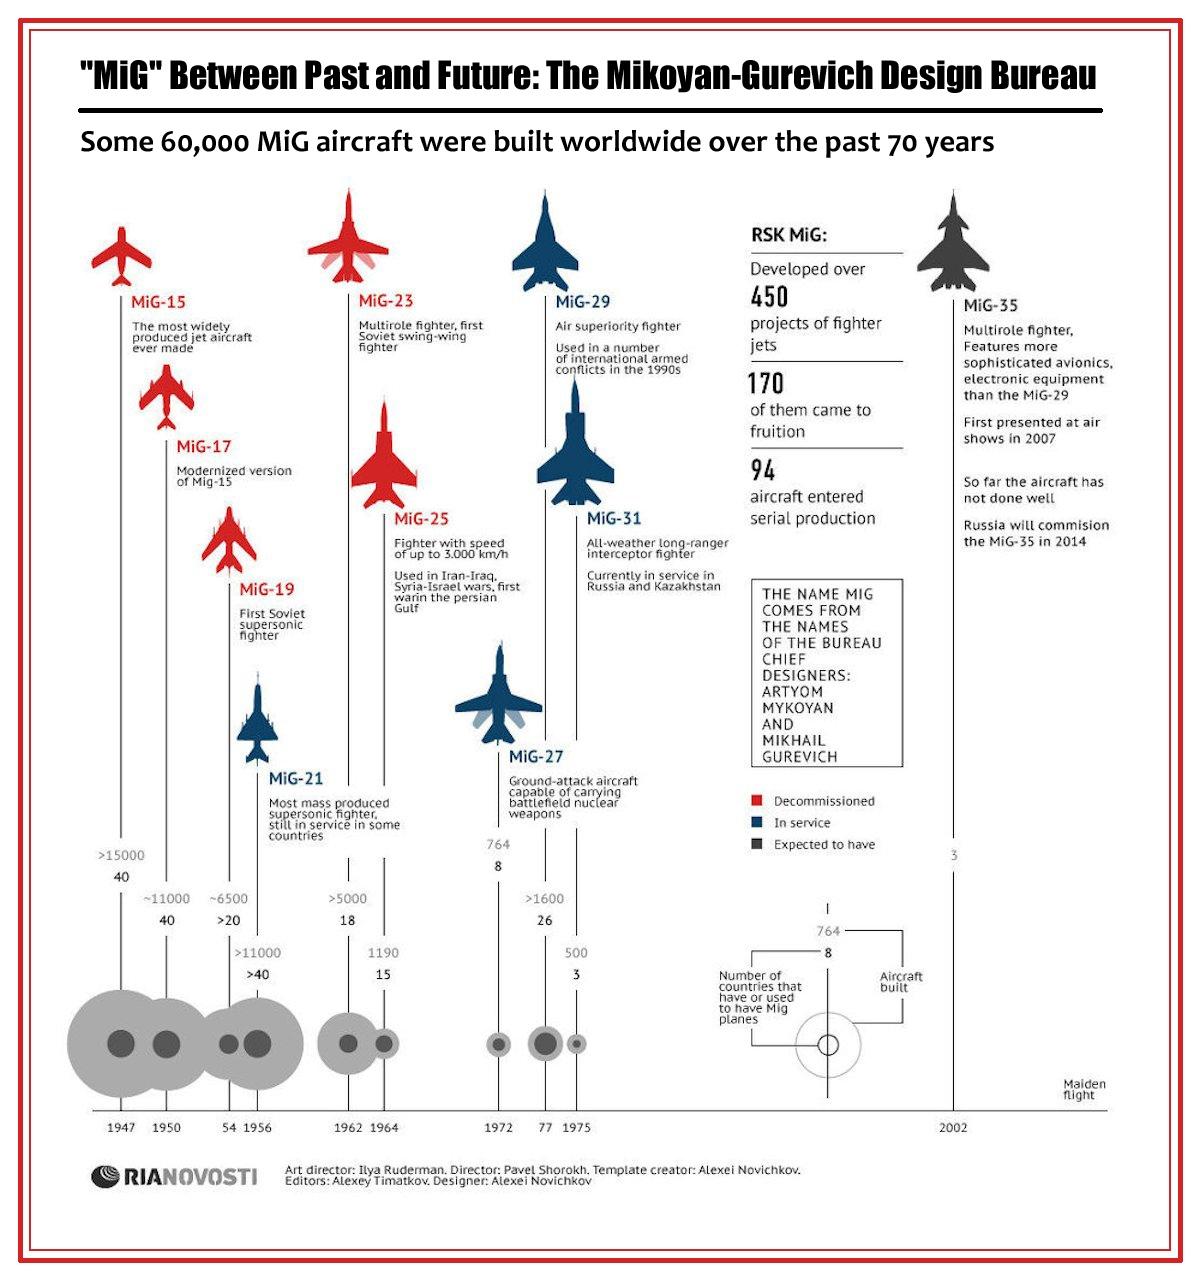 00 RIA-Novosti Infographics. 'MiG' Between Past and Future. Mikoyan-Gurevich Design Bureau. 2012